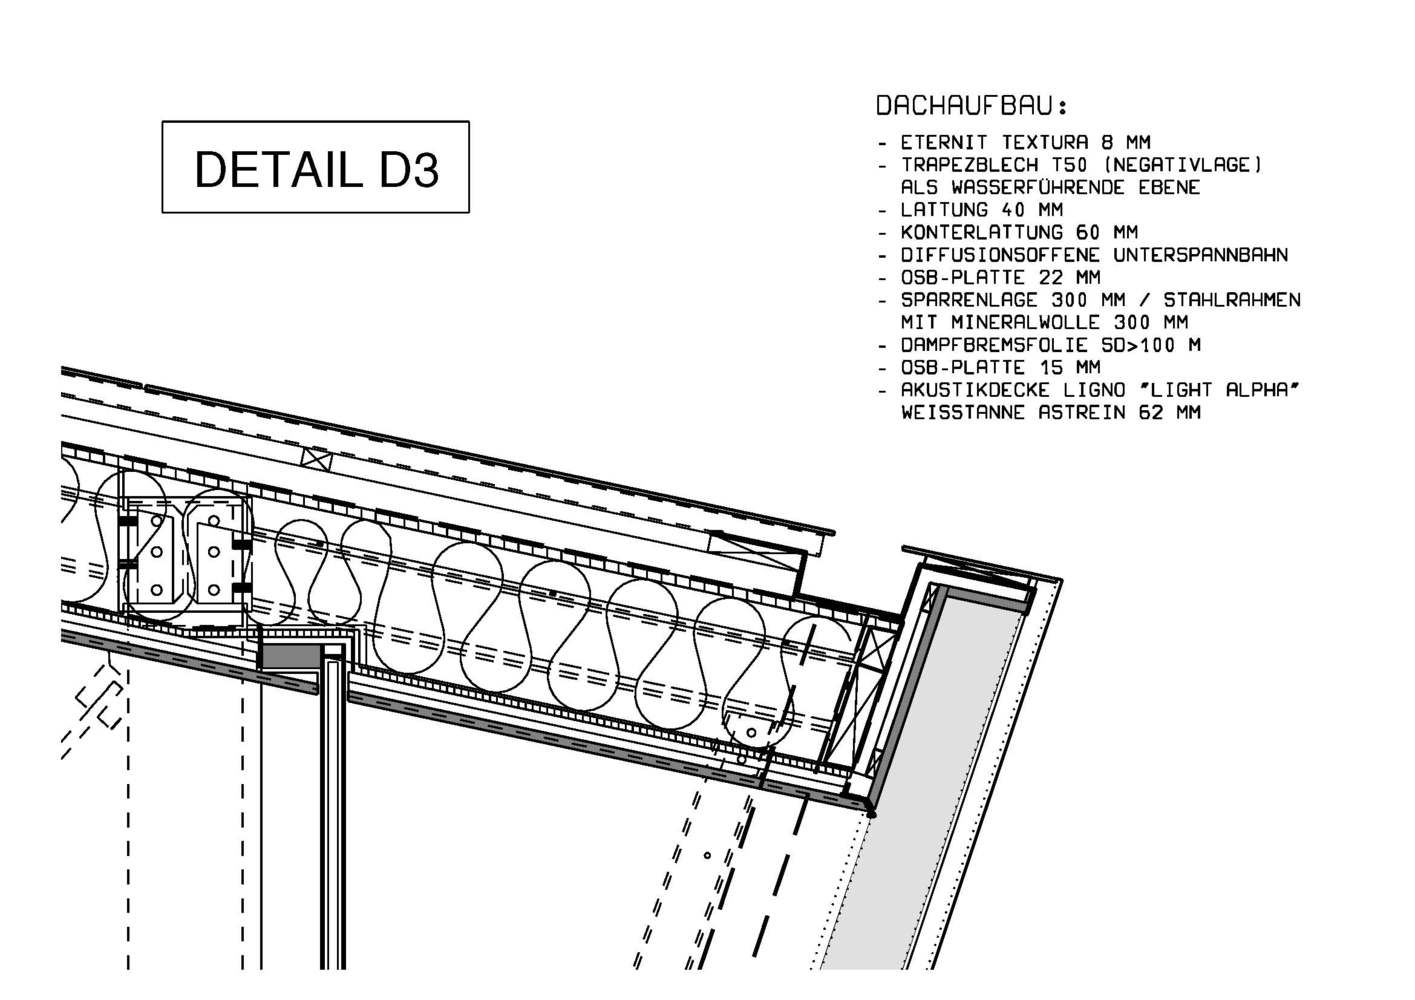 Architekt Radebeul architekt radebeul hausdesign pro